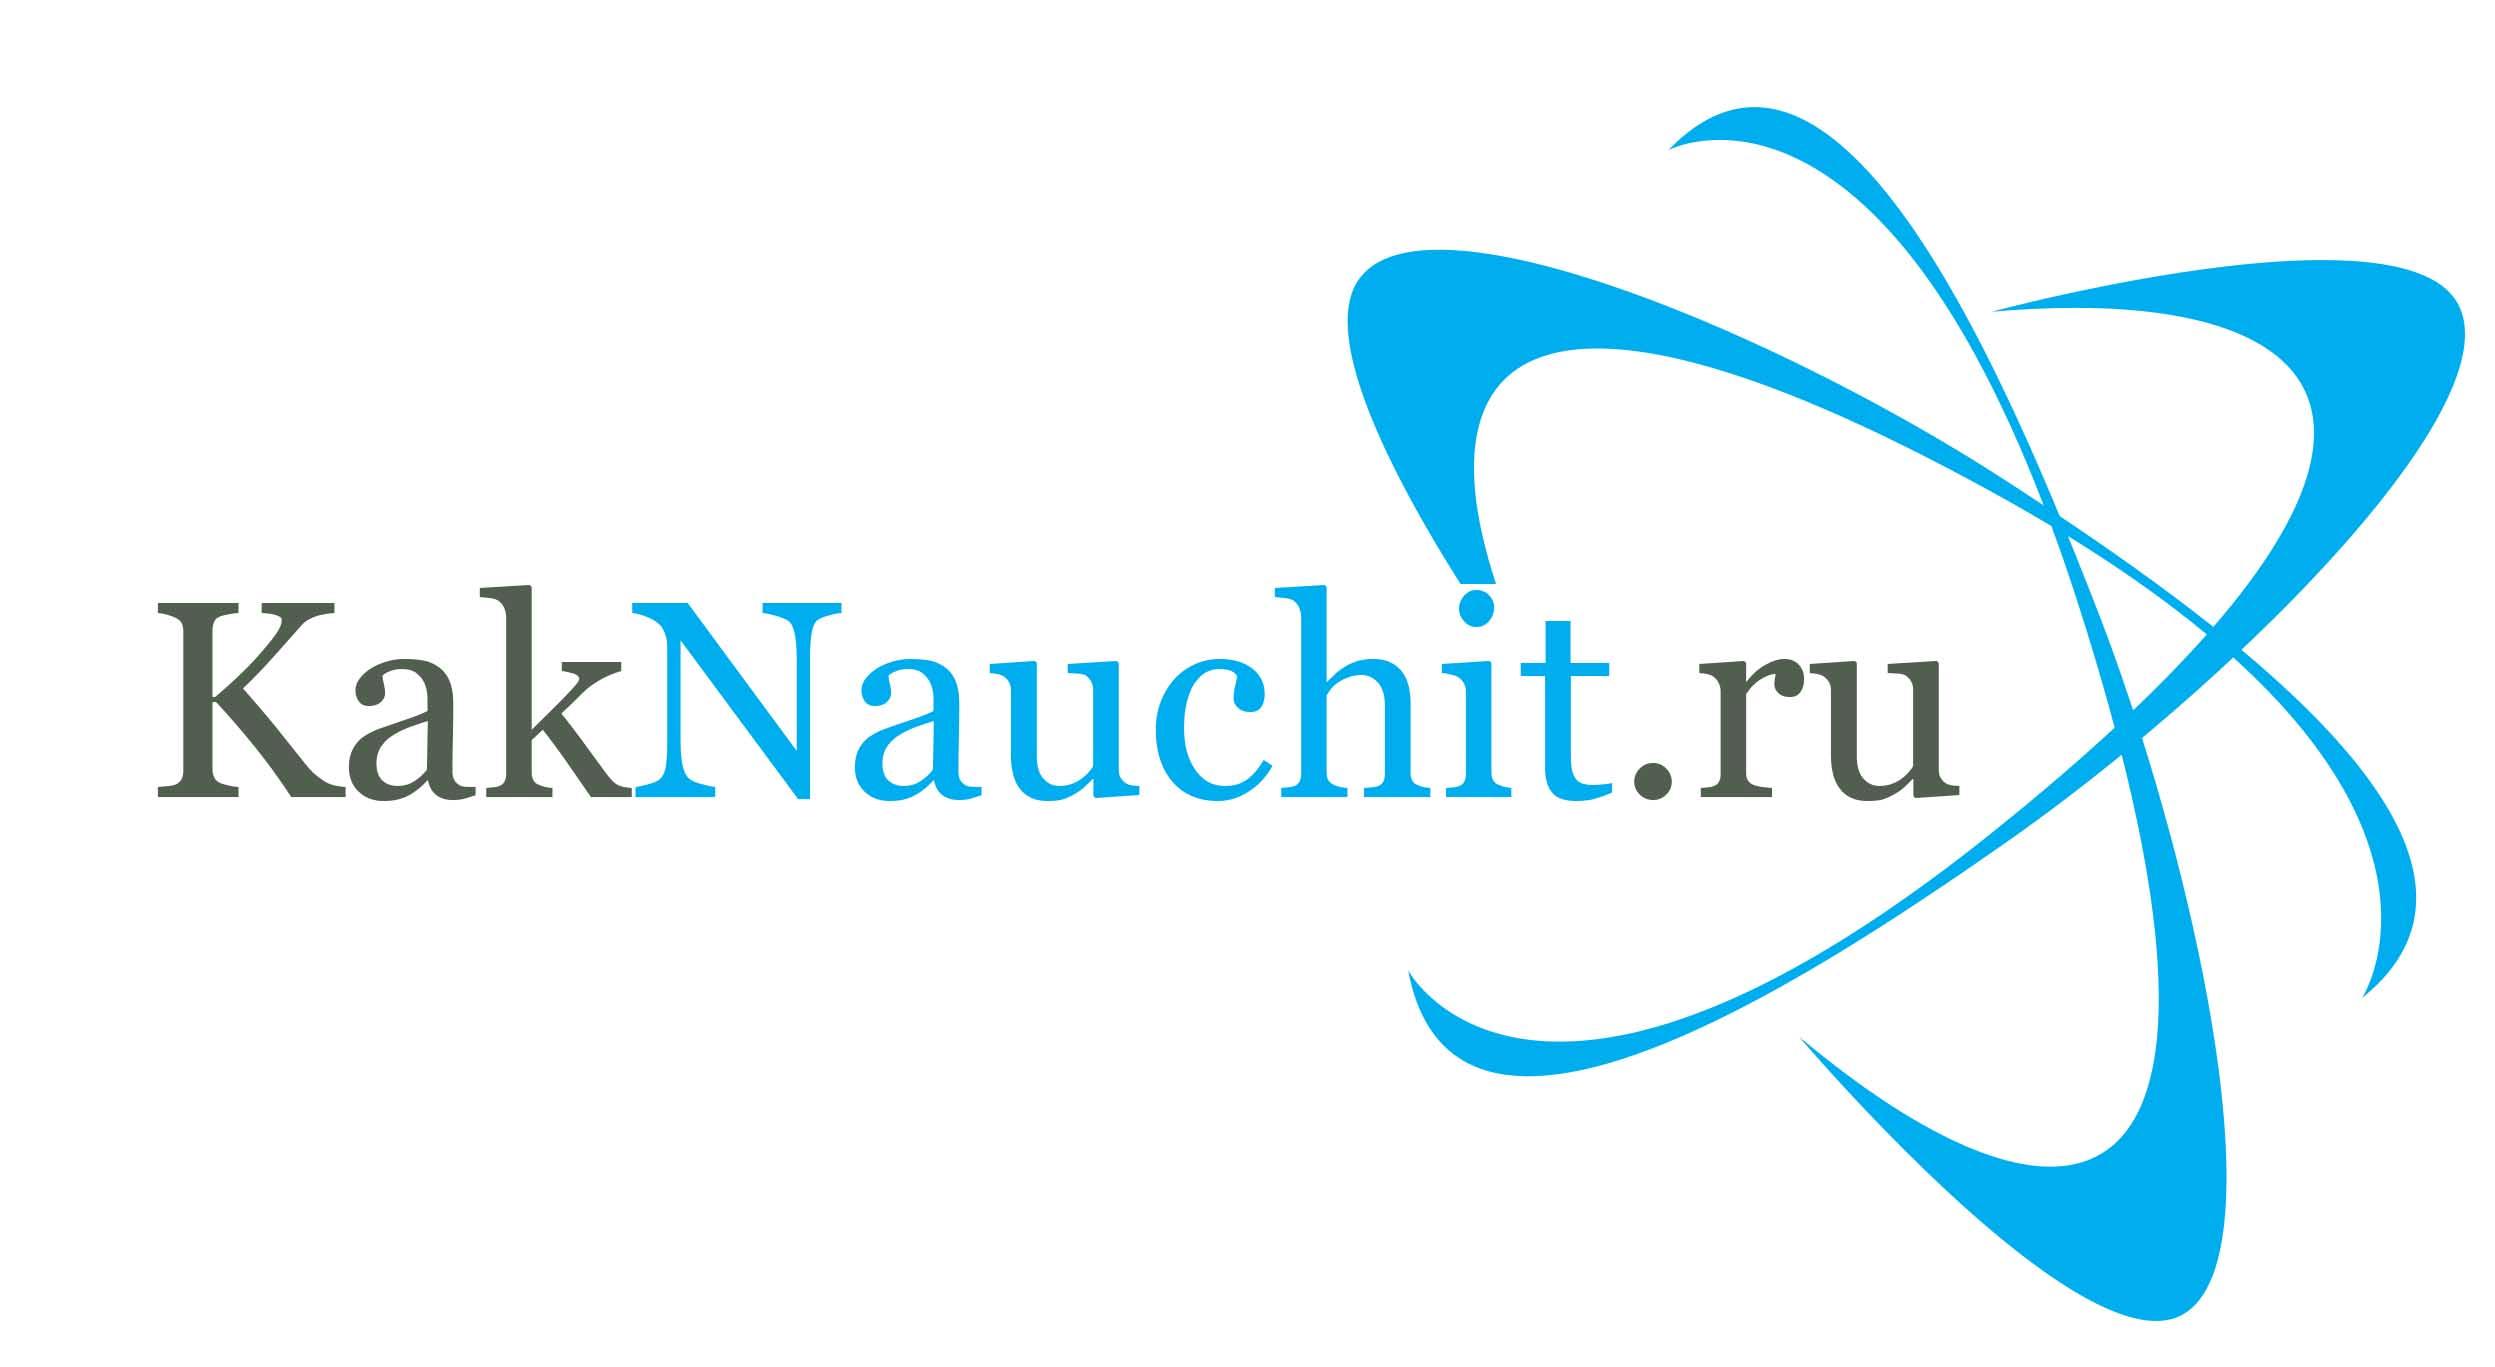 Kaknauchit.ru